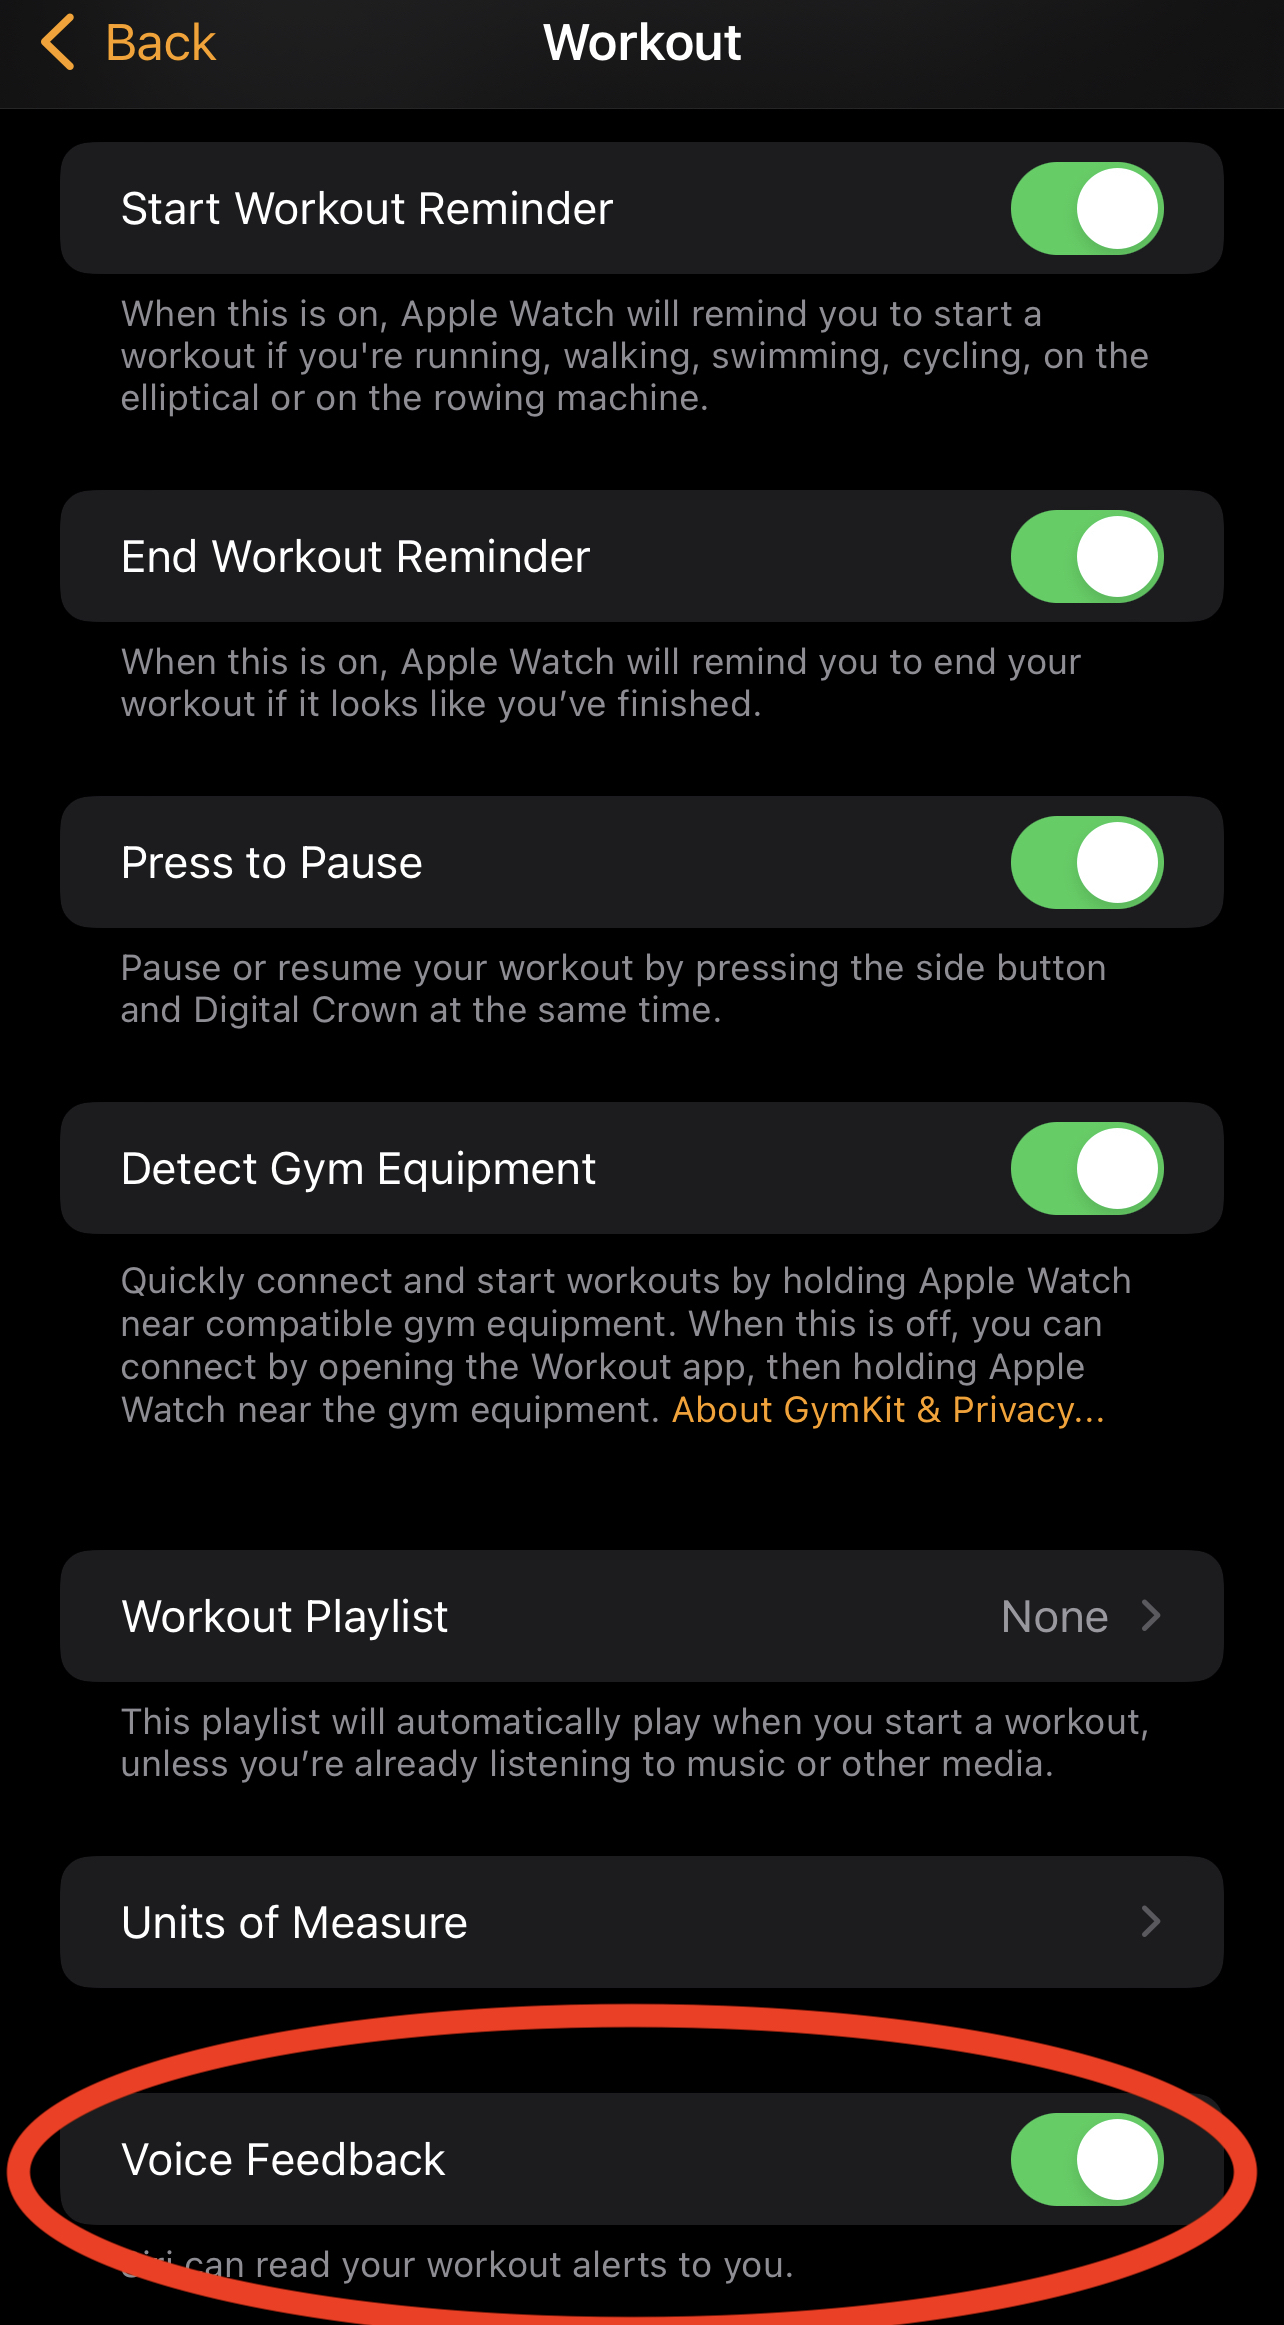 turn off voice feedback iPhone